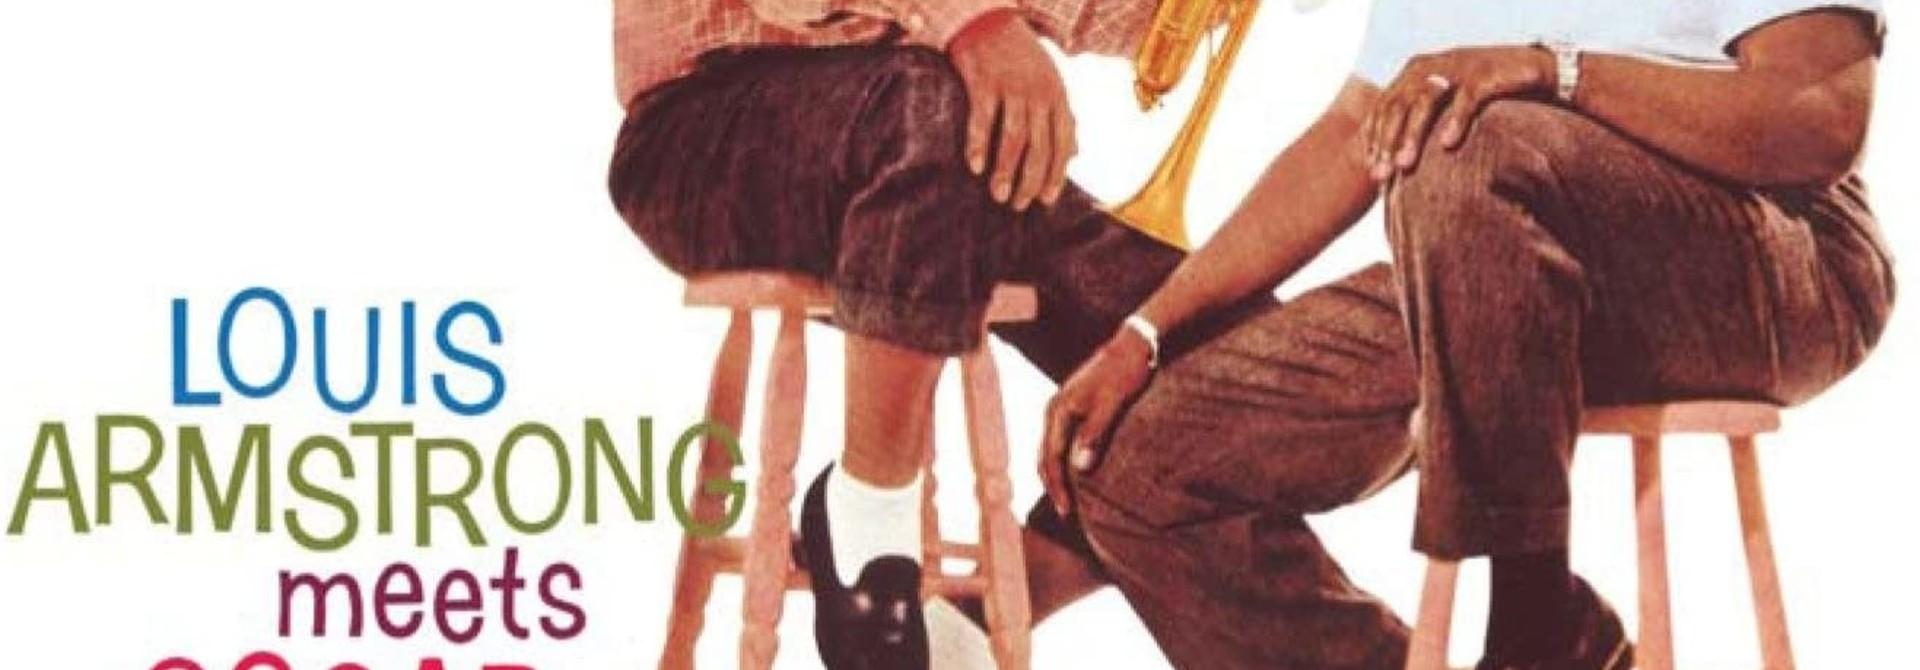 Louis Armstrong & Oscar Peter • Louis Armstrong Meets Oscar Peterson (Acoustic Sounds Series)